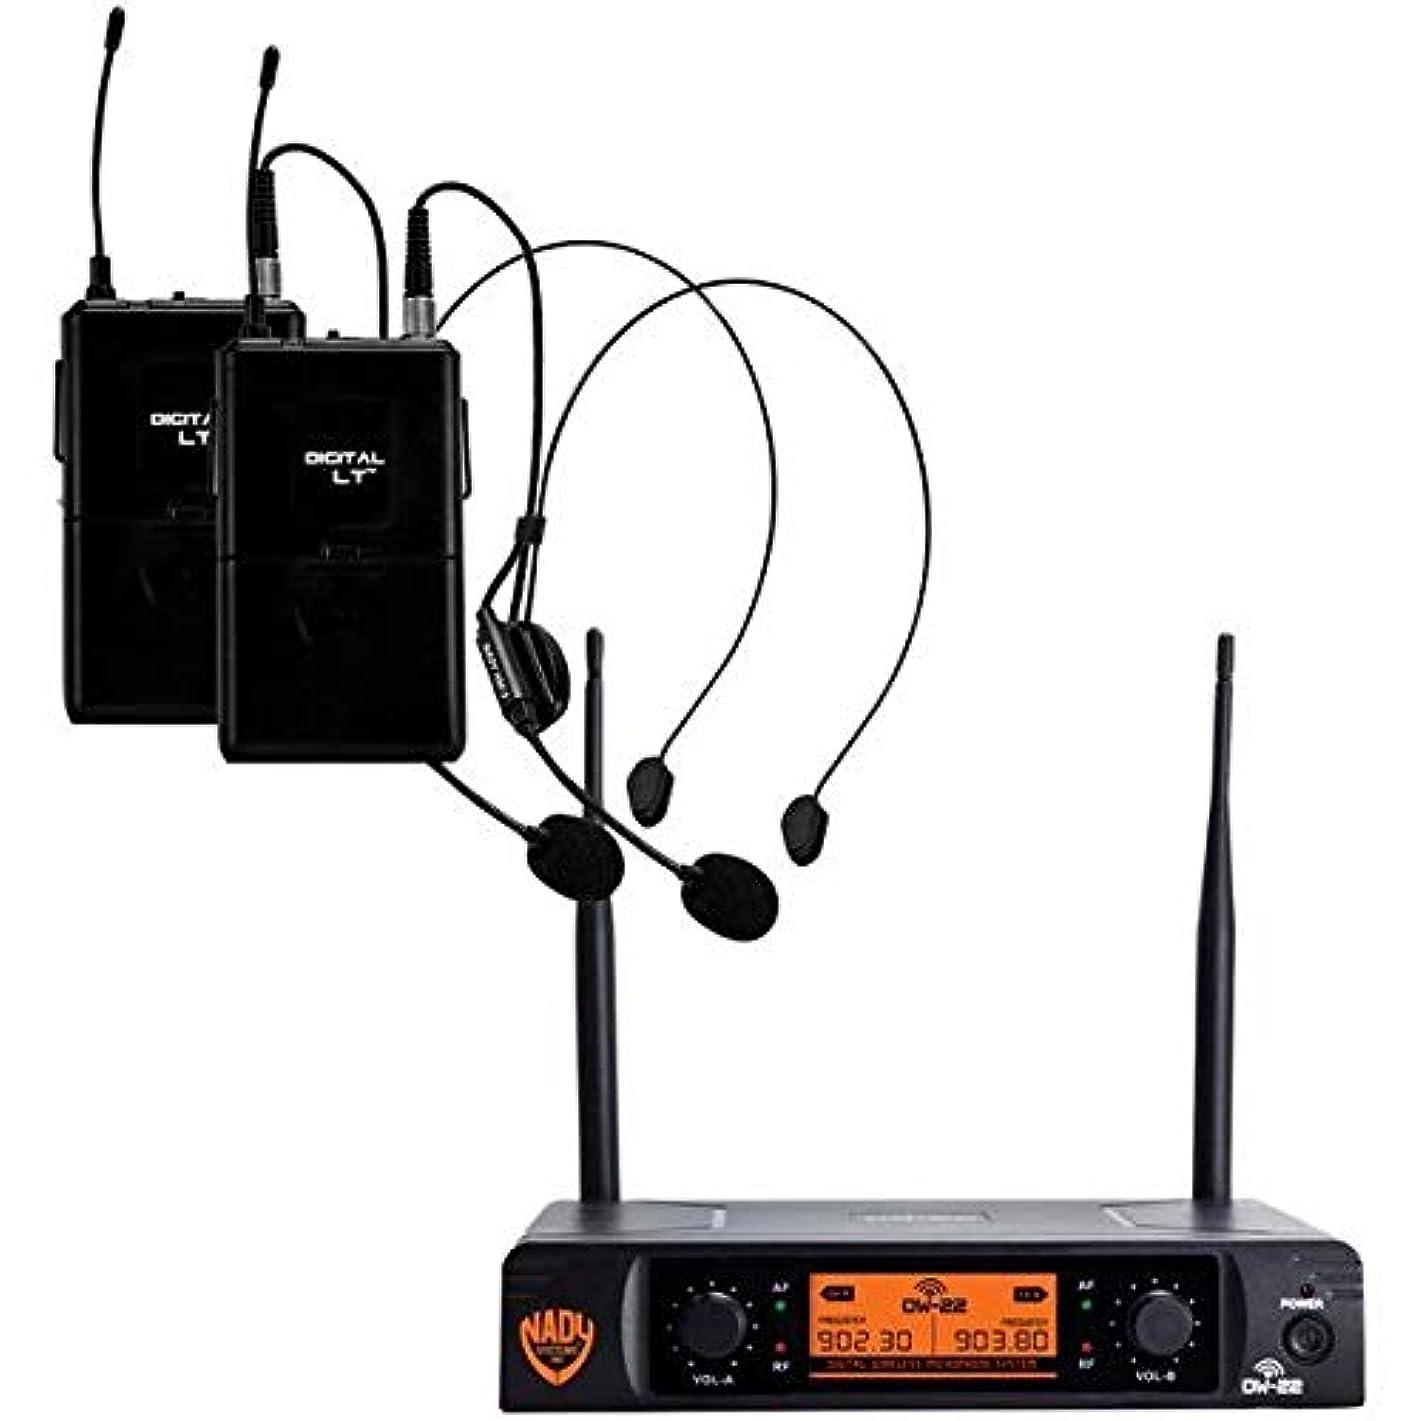 Nady(r) Dw-22-Hm-Any Dual-Transmitter Digital Wireless Microphone System (2 Digital Lt(tm) Hm-3 Headsets) 14.10in. x 12